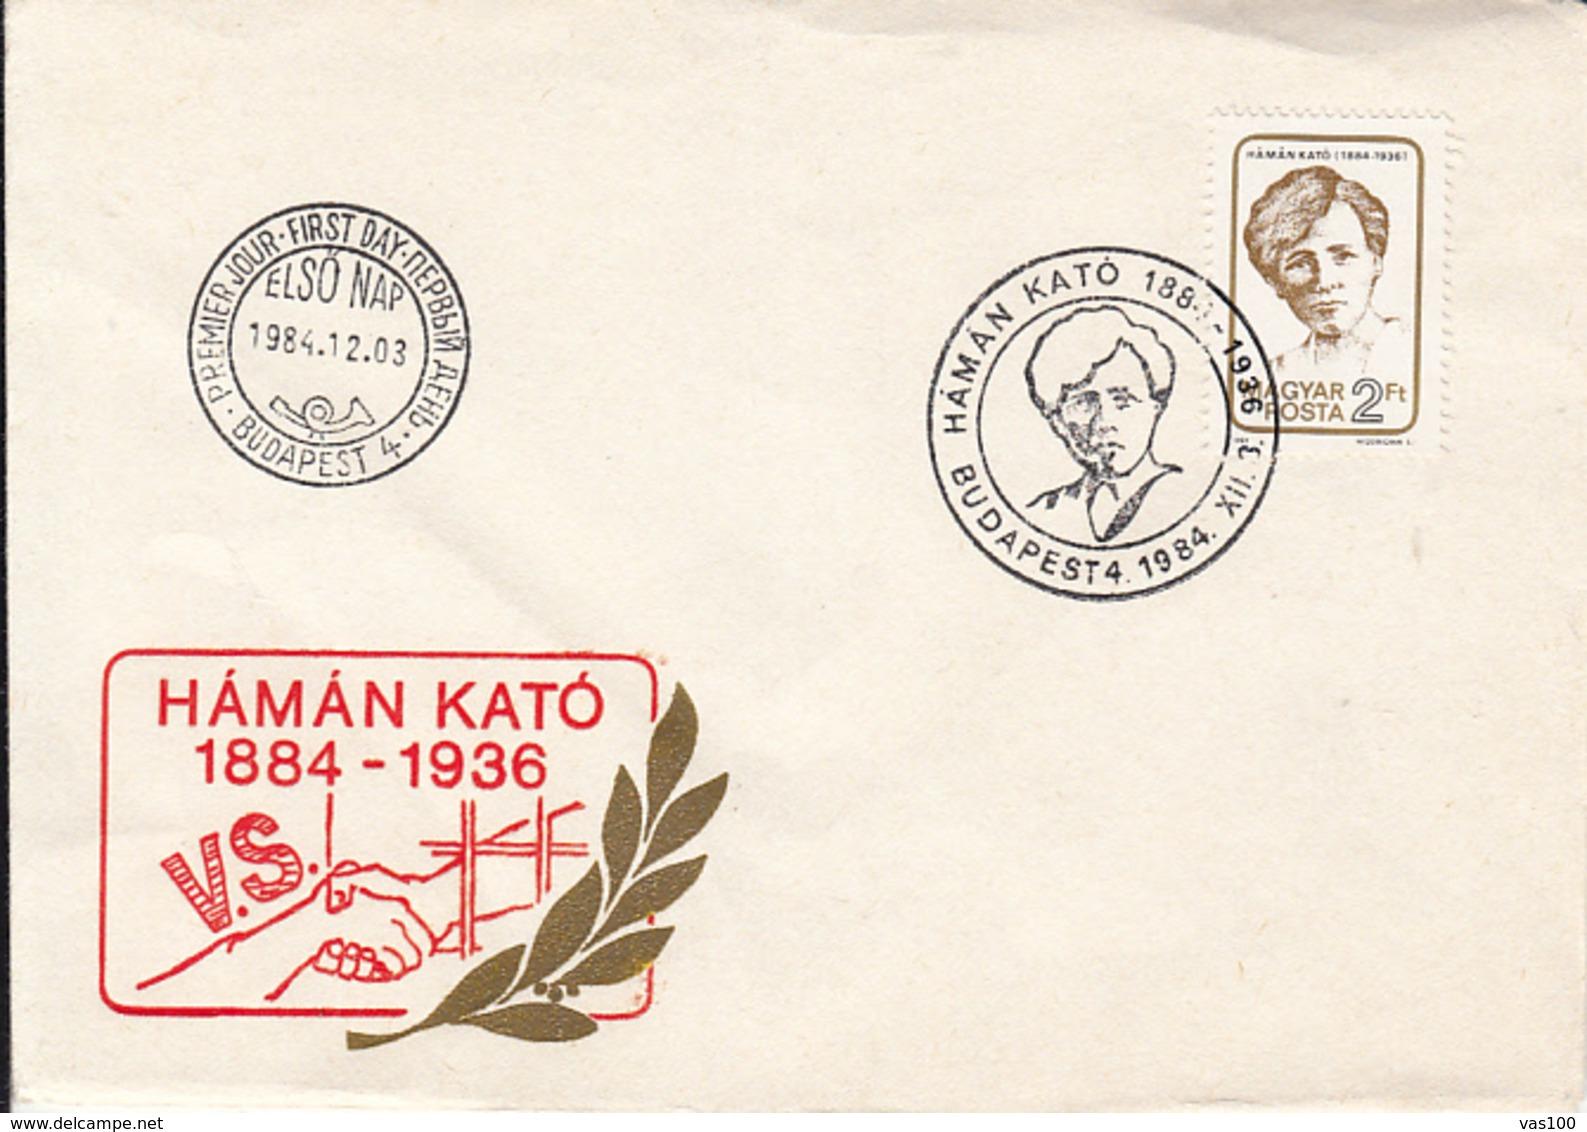 LANGUAGES, ESPERANTO, HAMAN KATO, SPECIAL COVER, OBLIT FDC, 1984, HUNGARY - Esperanto